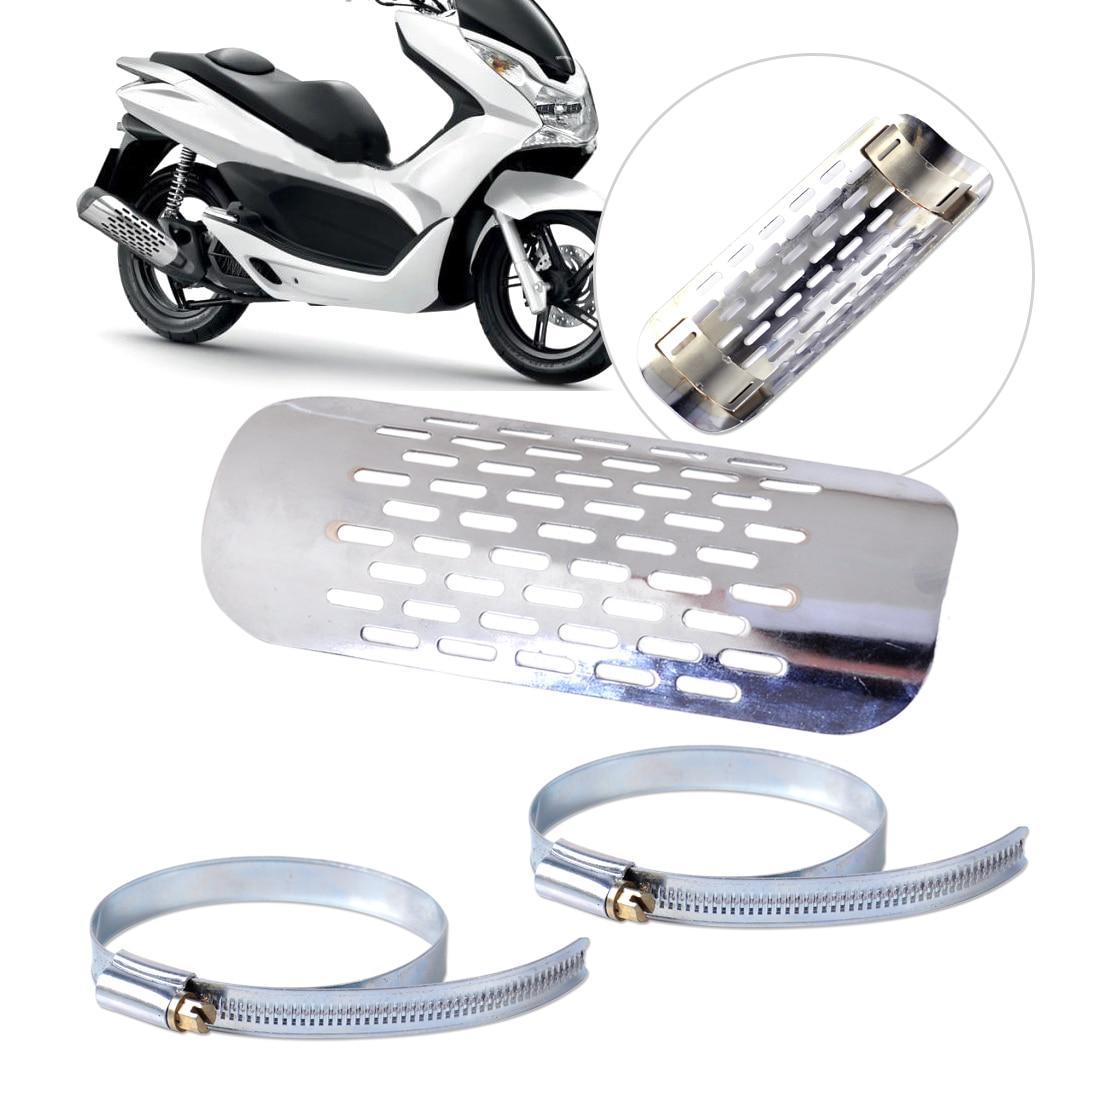 Motorrad Auspuff Hitzeschild Schalldämpfer Hitzeschutzblech passt für Kawasaki